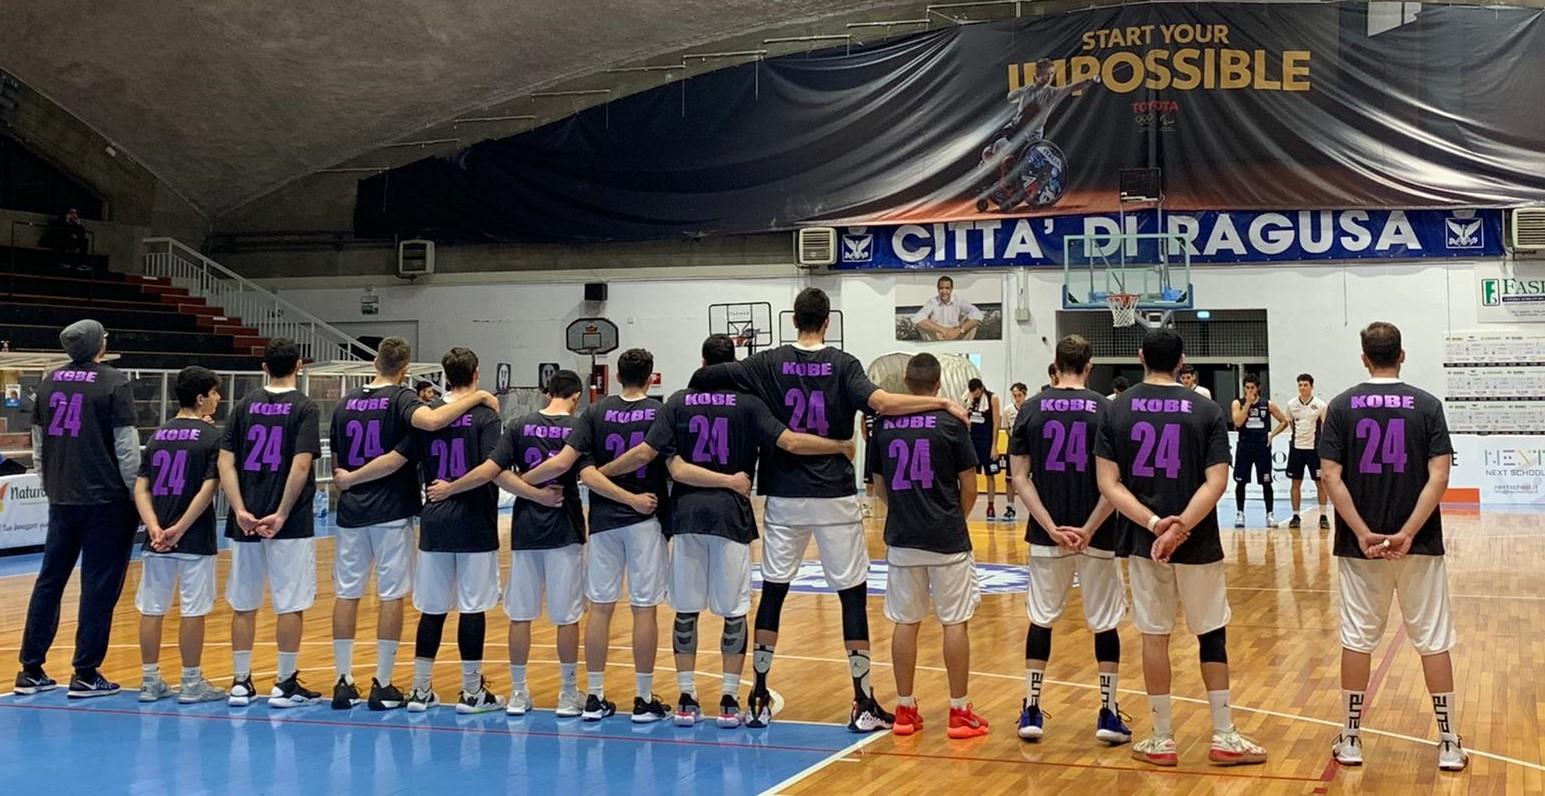 Basket, serie C Silver: la Virtus Ragusa batte il Gravina nel ricordo di Kobe Bryant